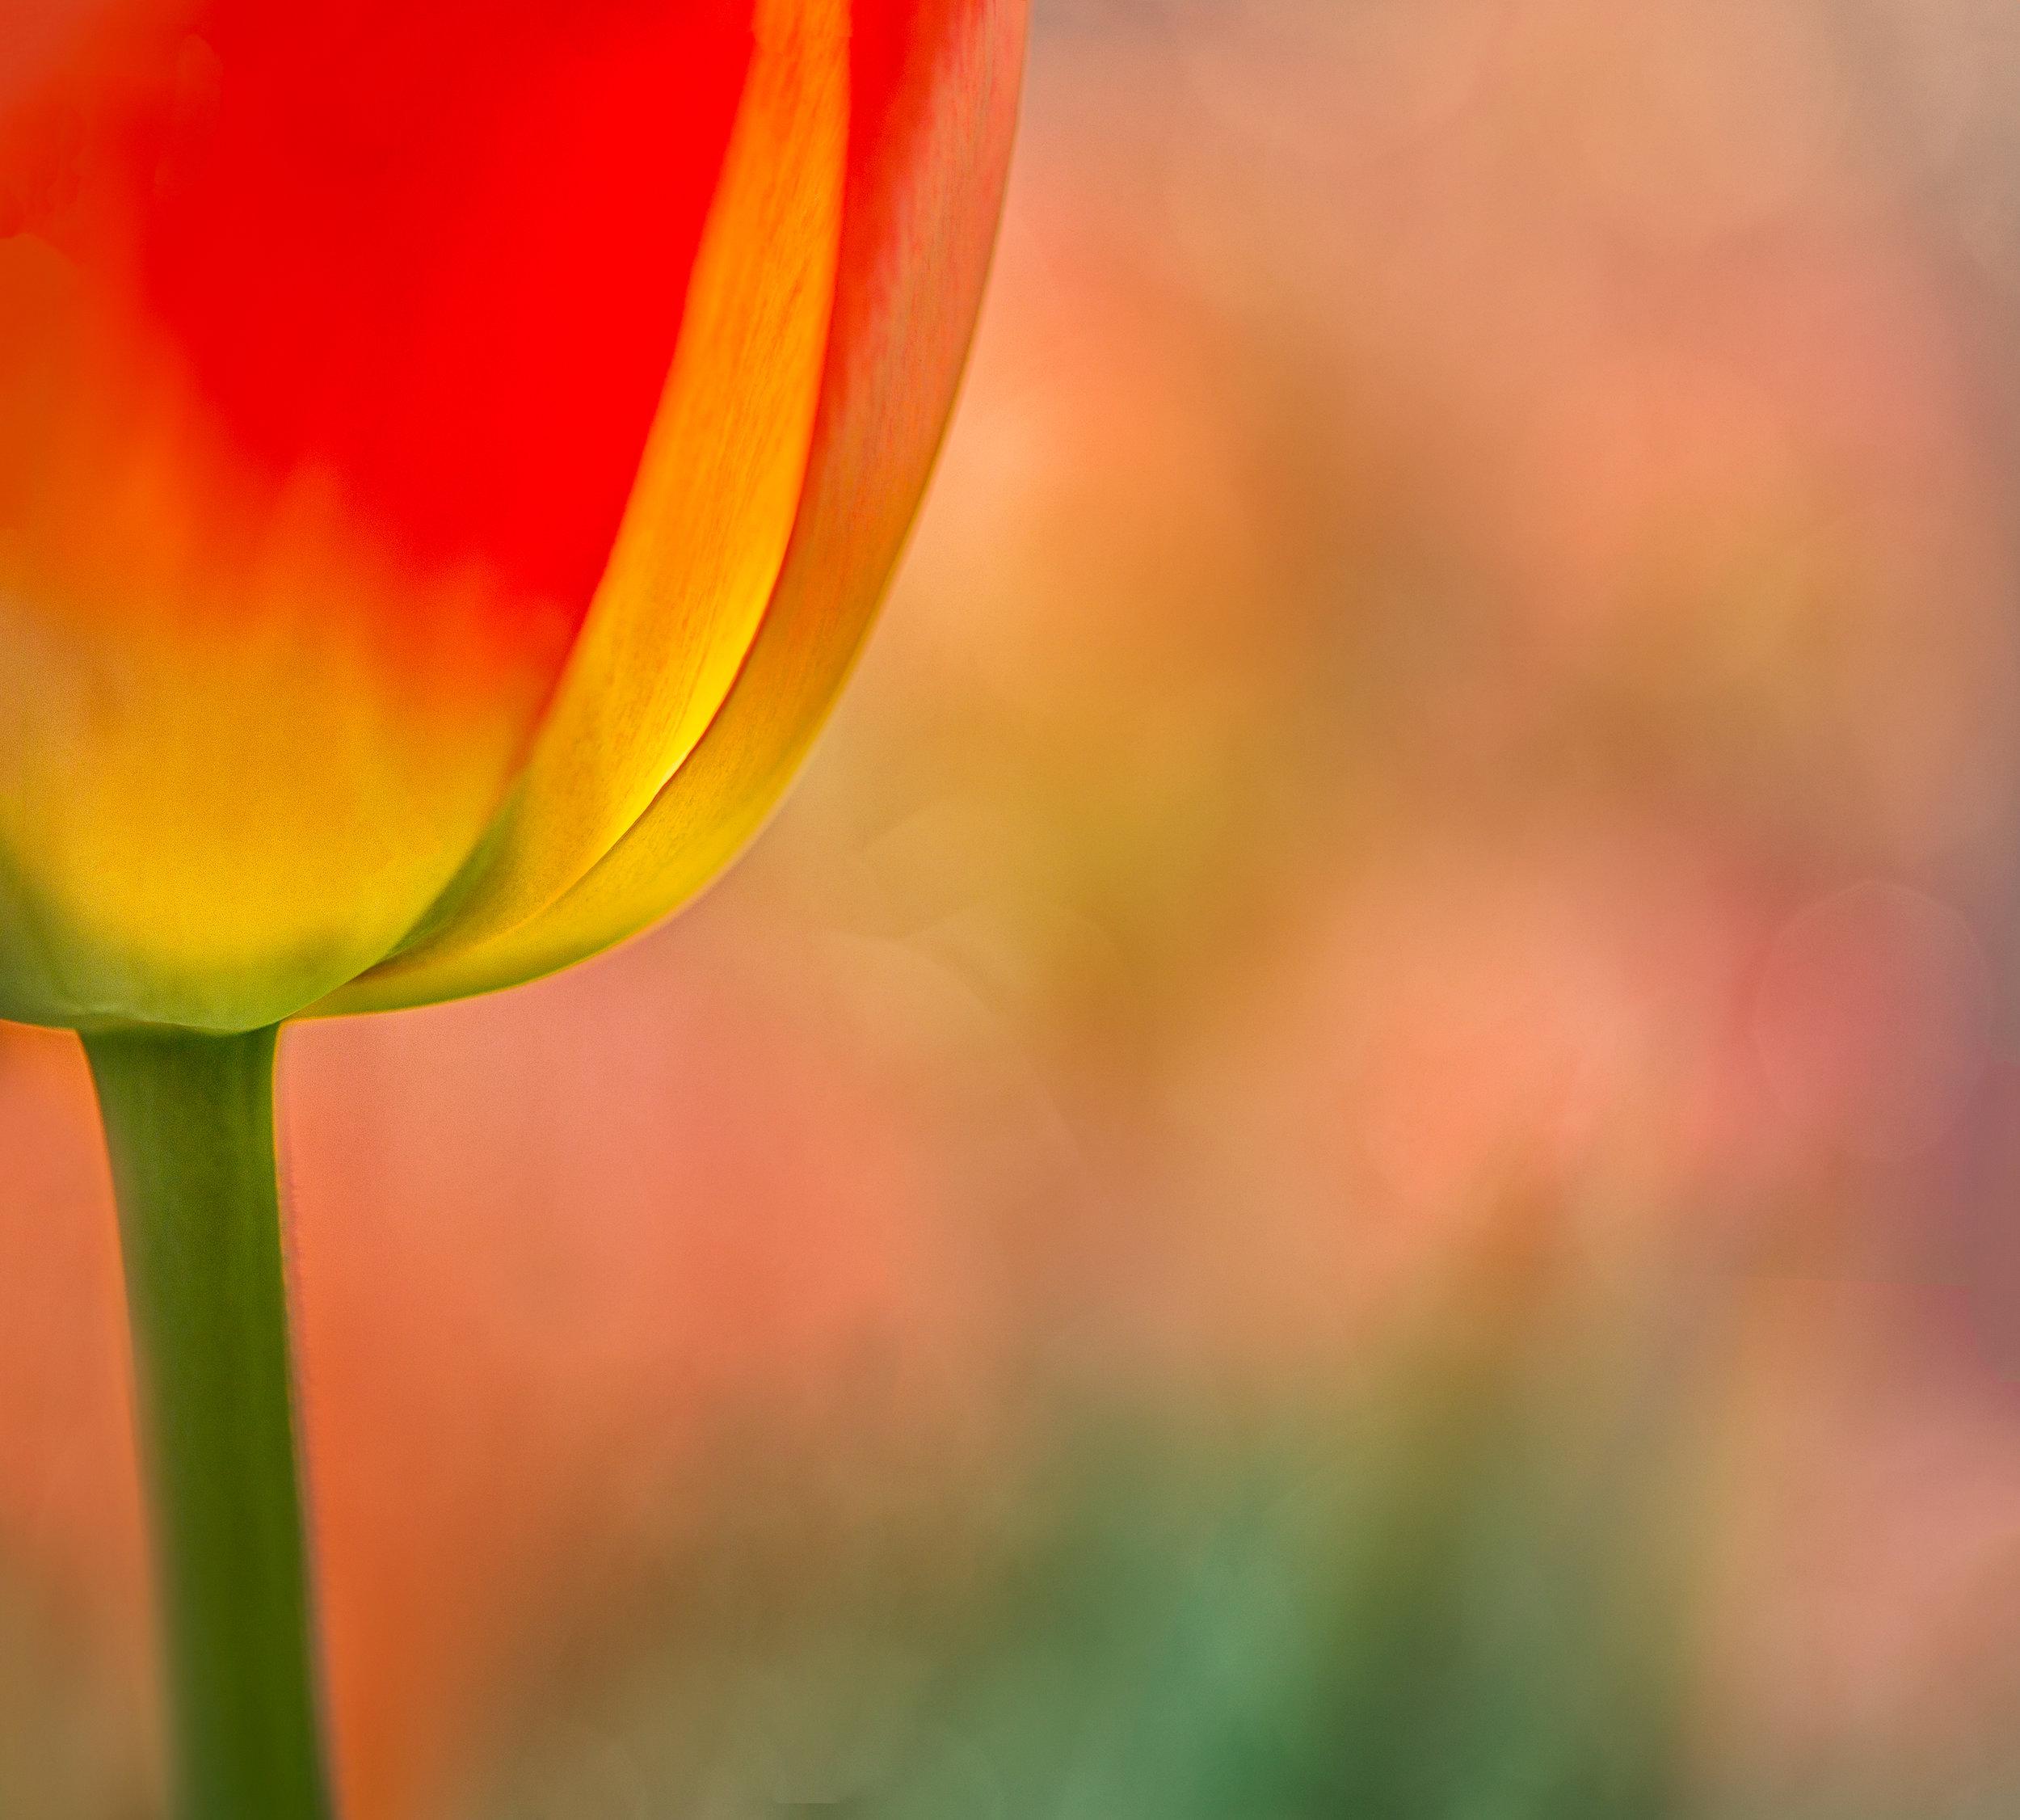 tulip glow2-edit.jpg